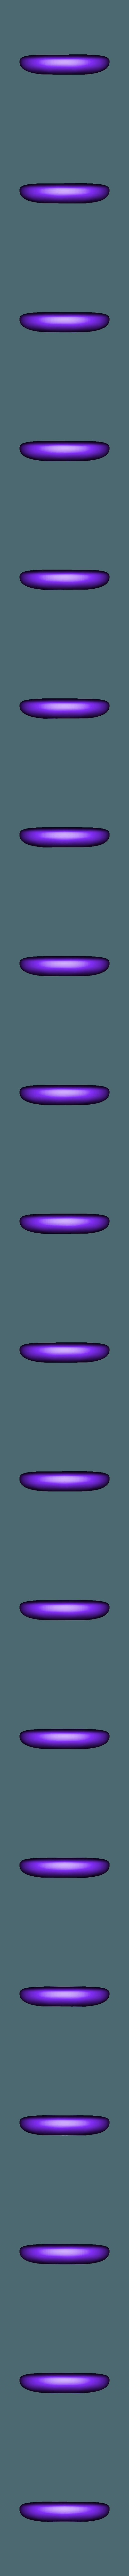 8-Top-Plate-Neck.stl Download free STL file Bath and Body Works - Candle Holder (10cm Ø) • 3D print design, crisonescu